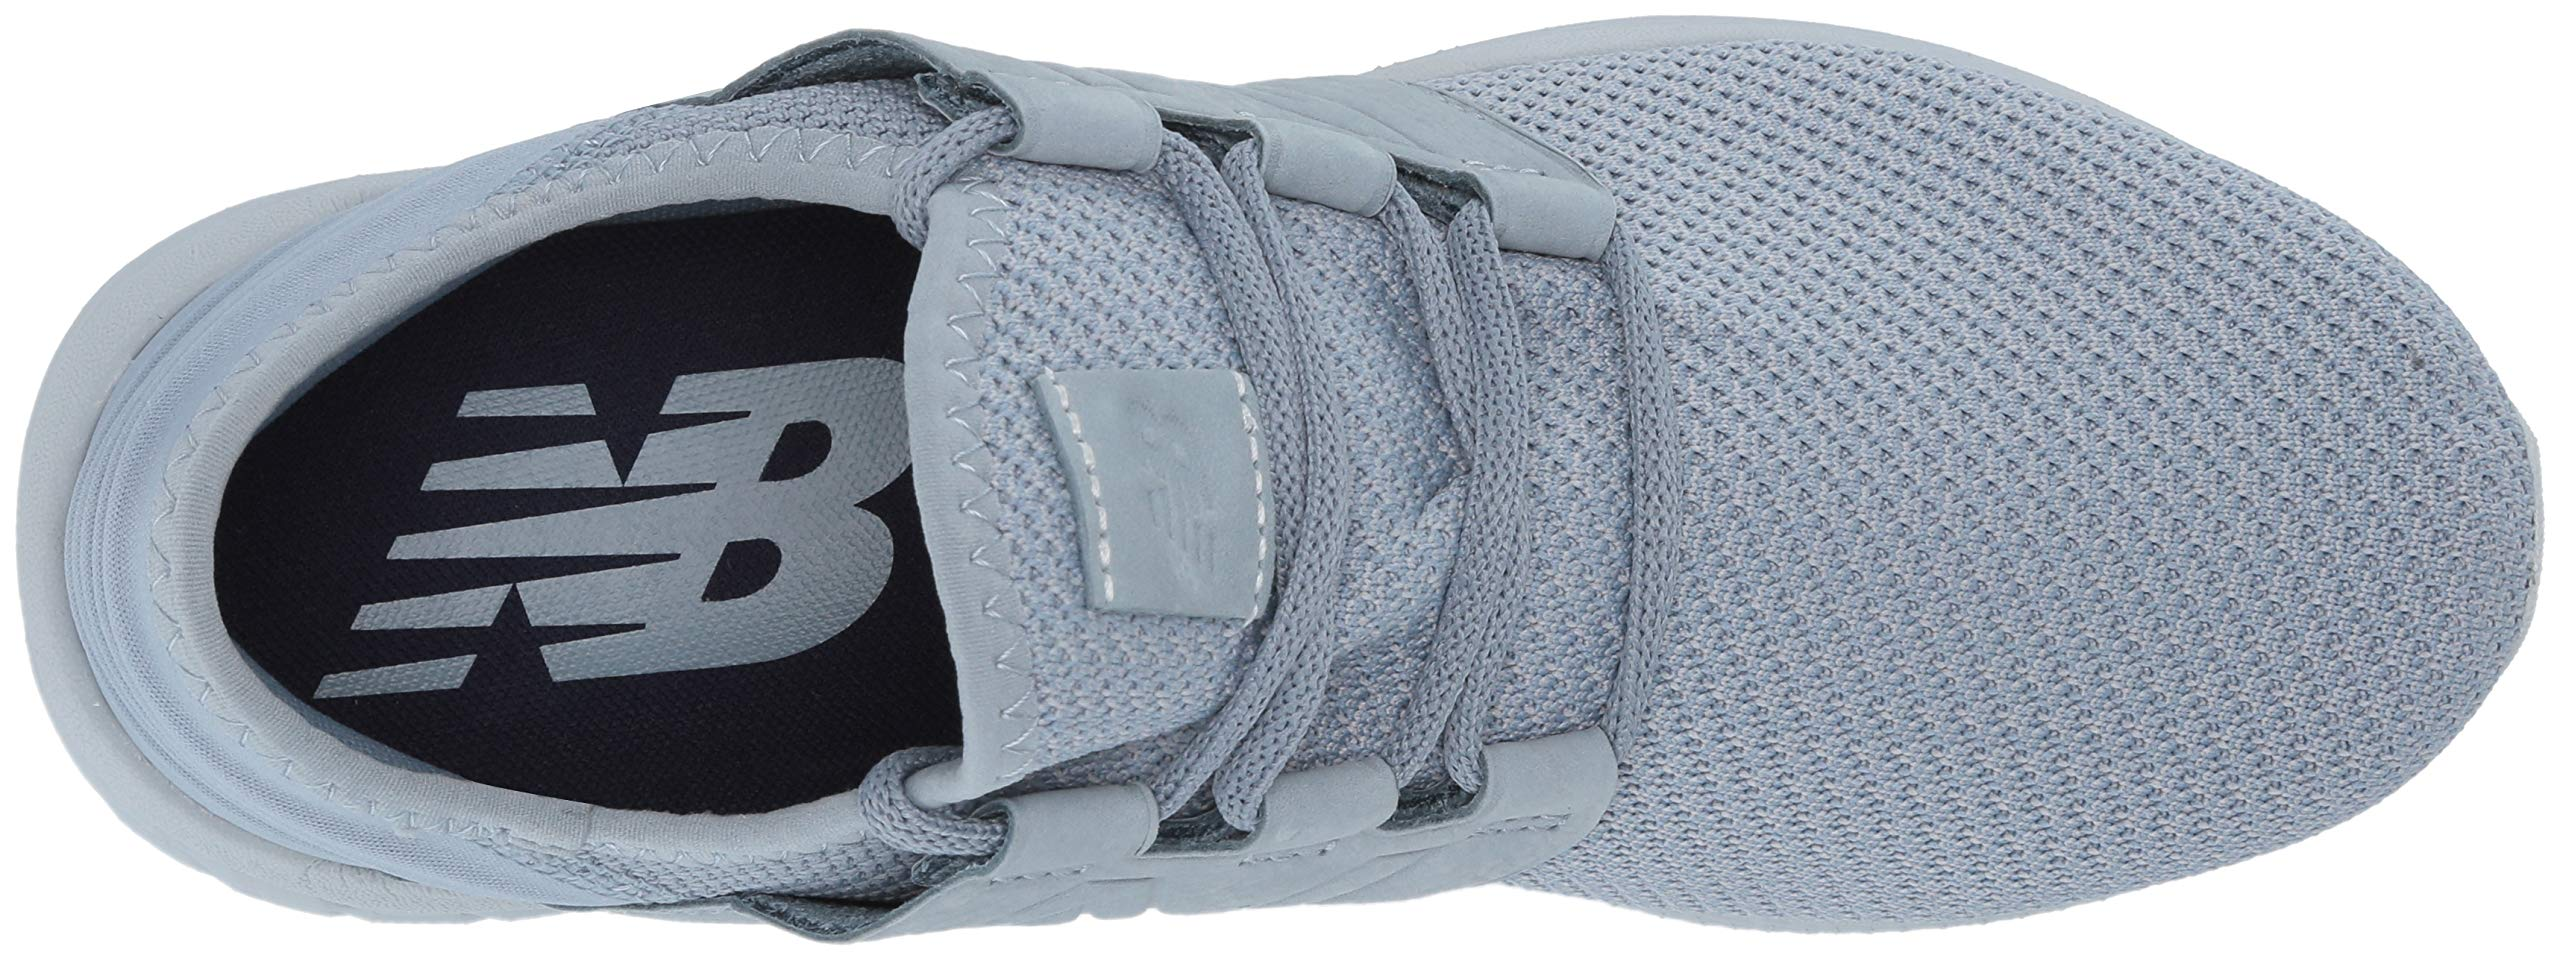 New Balance Women's Cruz V2 Fresh Foam Running Shoe, Reflection/Light Cyclone, 5 B US by New Balance (Image #7)